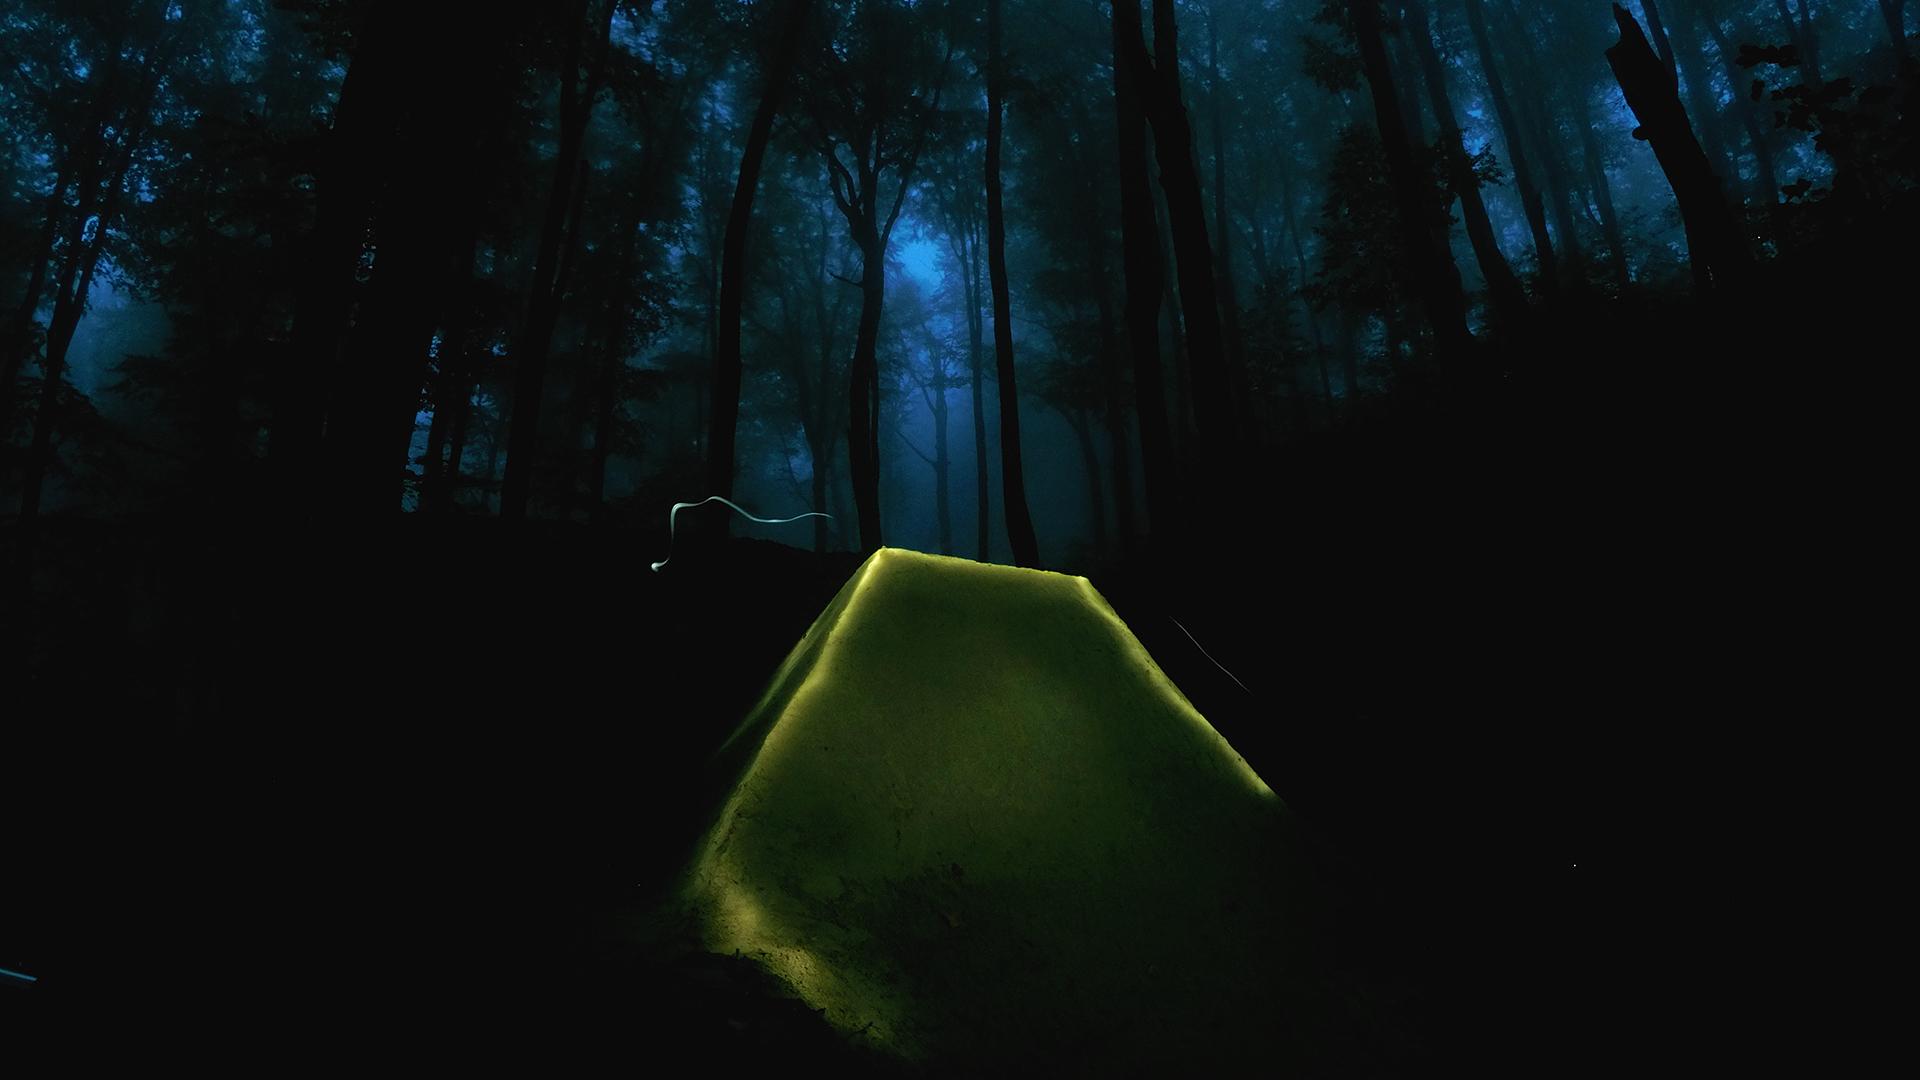 General 1920x1080 forest trees beech mist long exposure dusk nature